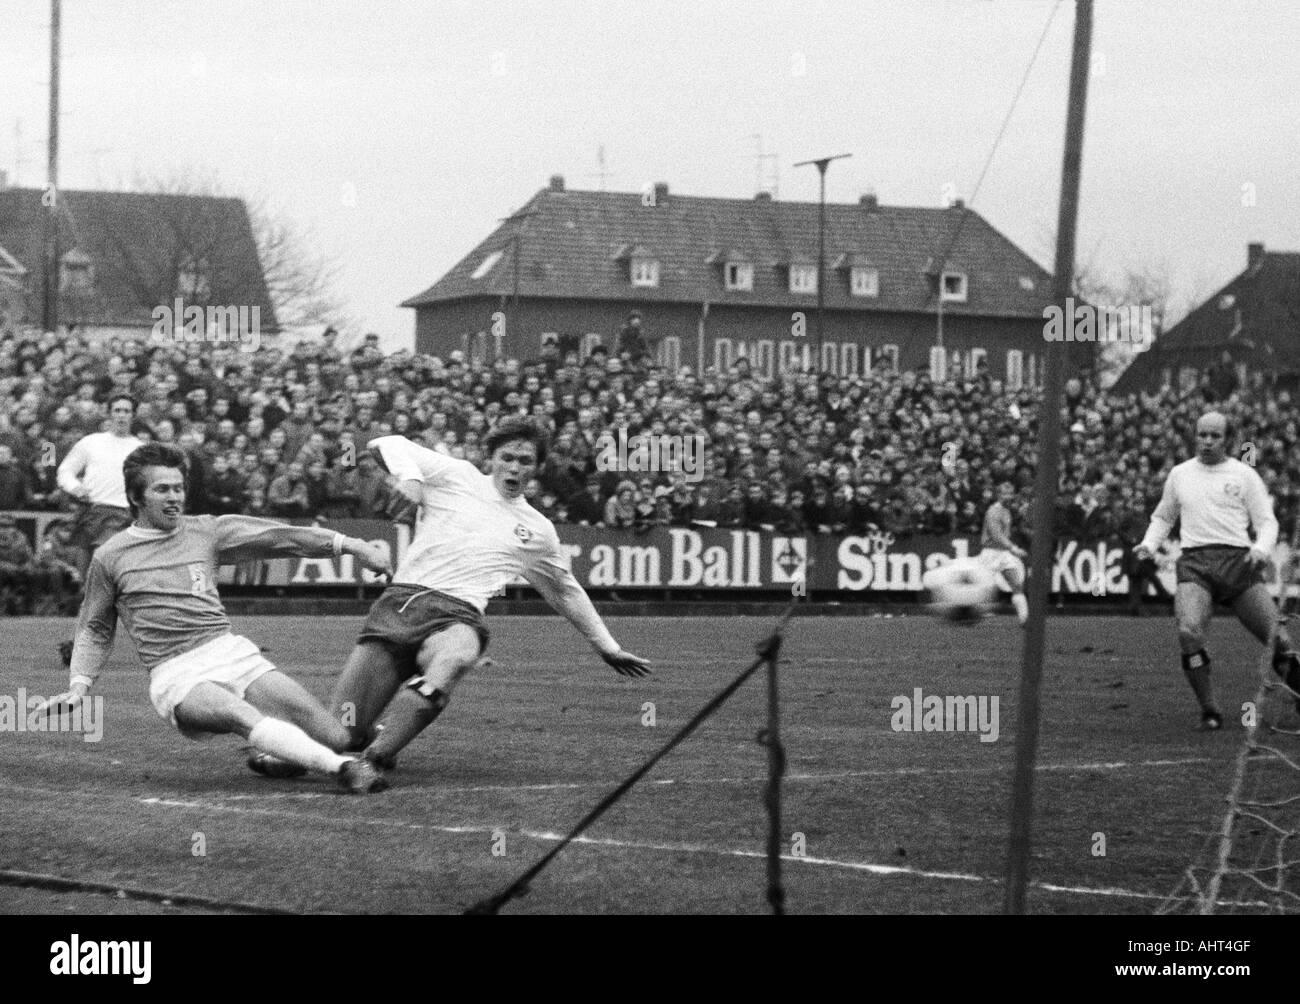 football, Bundesliga, 1970/1971, Boekelberg Stadium, Borussia Moenchengladbach versus Hamburger SV 3:0, scene of the match, f.l.t.r. Juergen Kurbjuhn (HSV), Jupp Heynckes (MG), Peter Nogly, Charly Doerfel (both HSV) - Stock Image